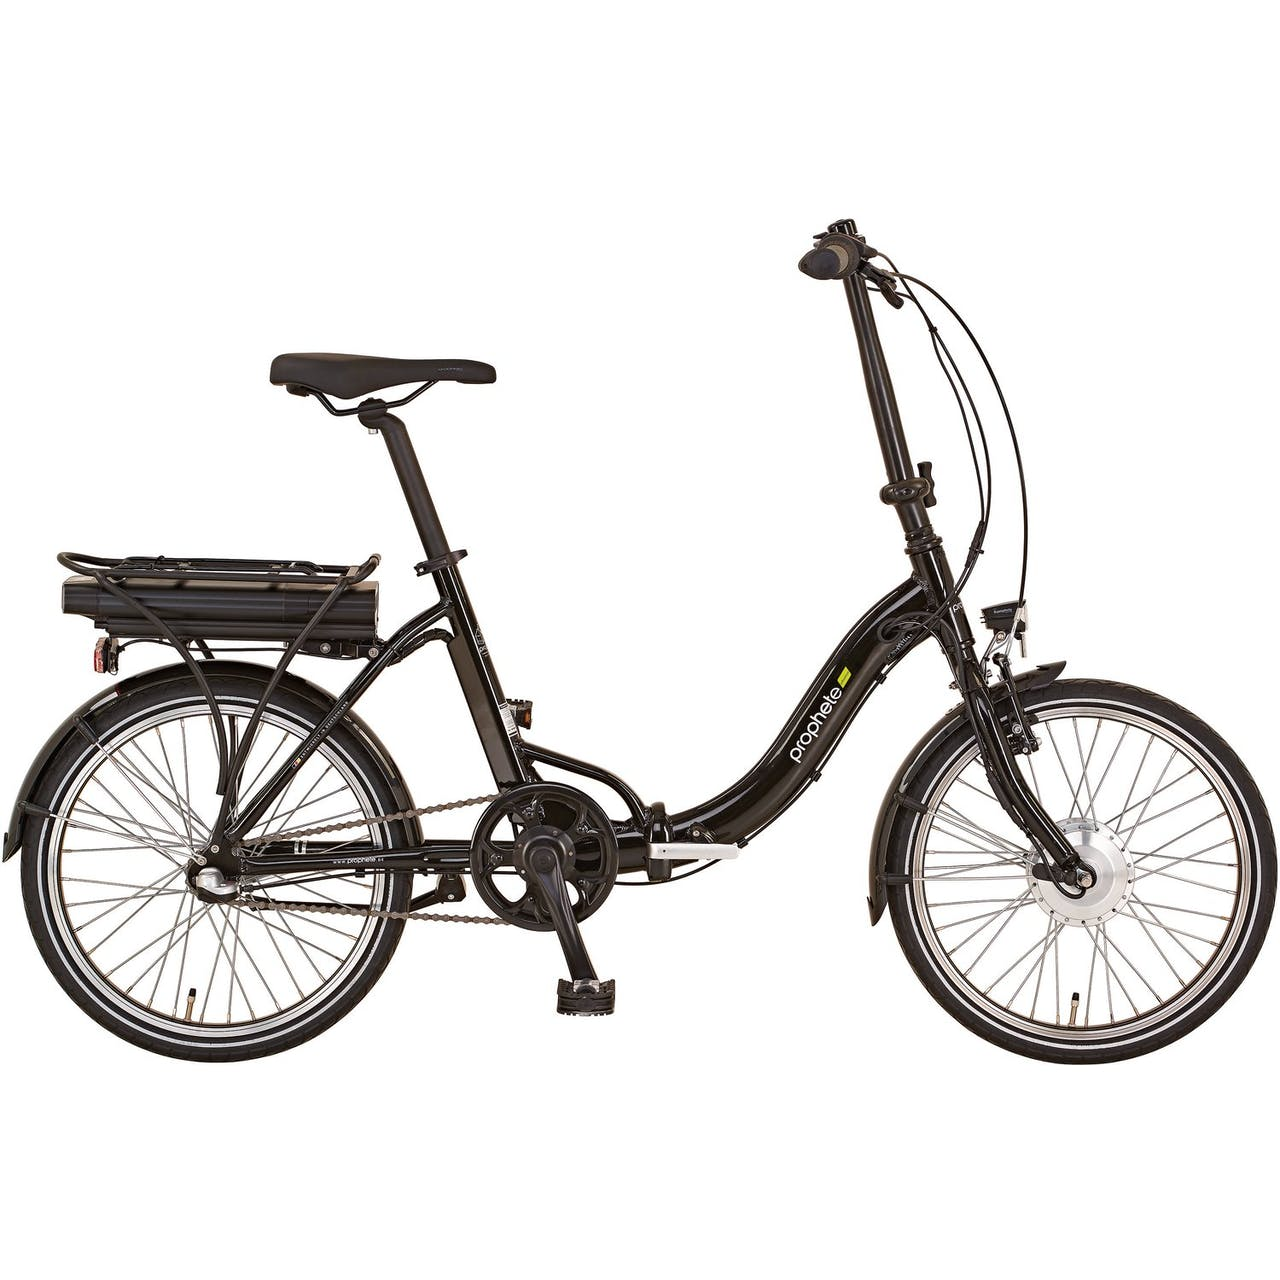 "Prophete E-Bike Unisex City-Fahrrad 20"" Urbanicer 20.ESU.10"